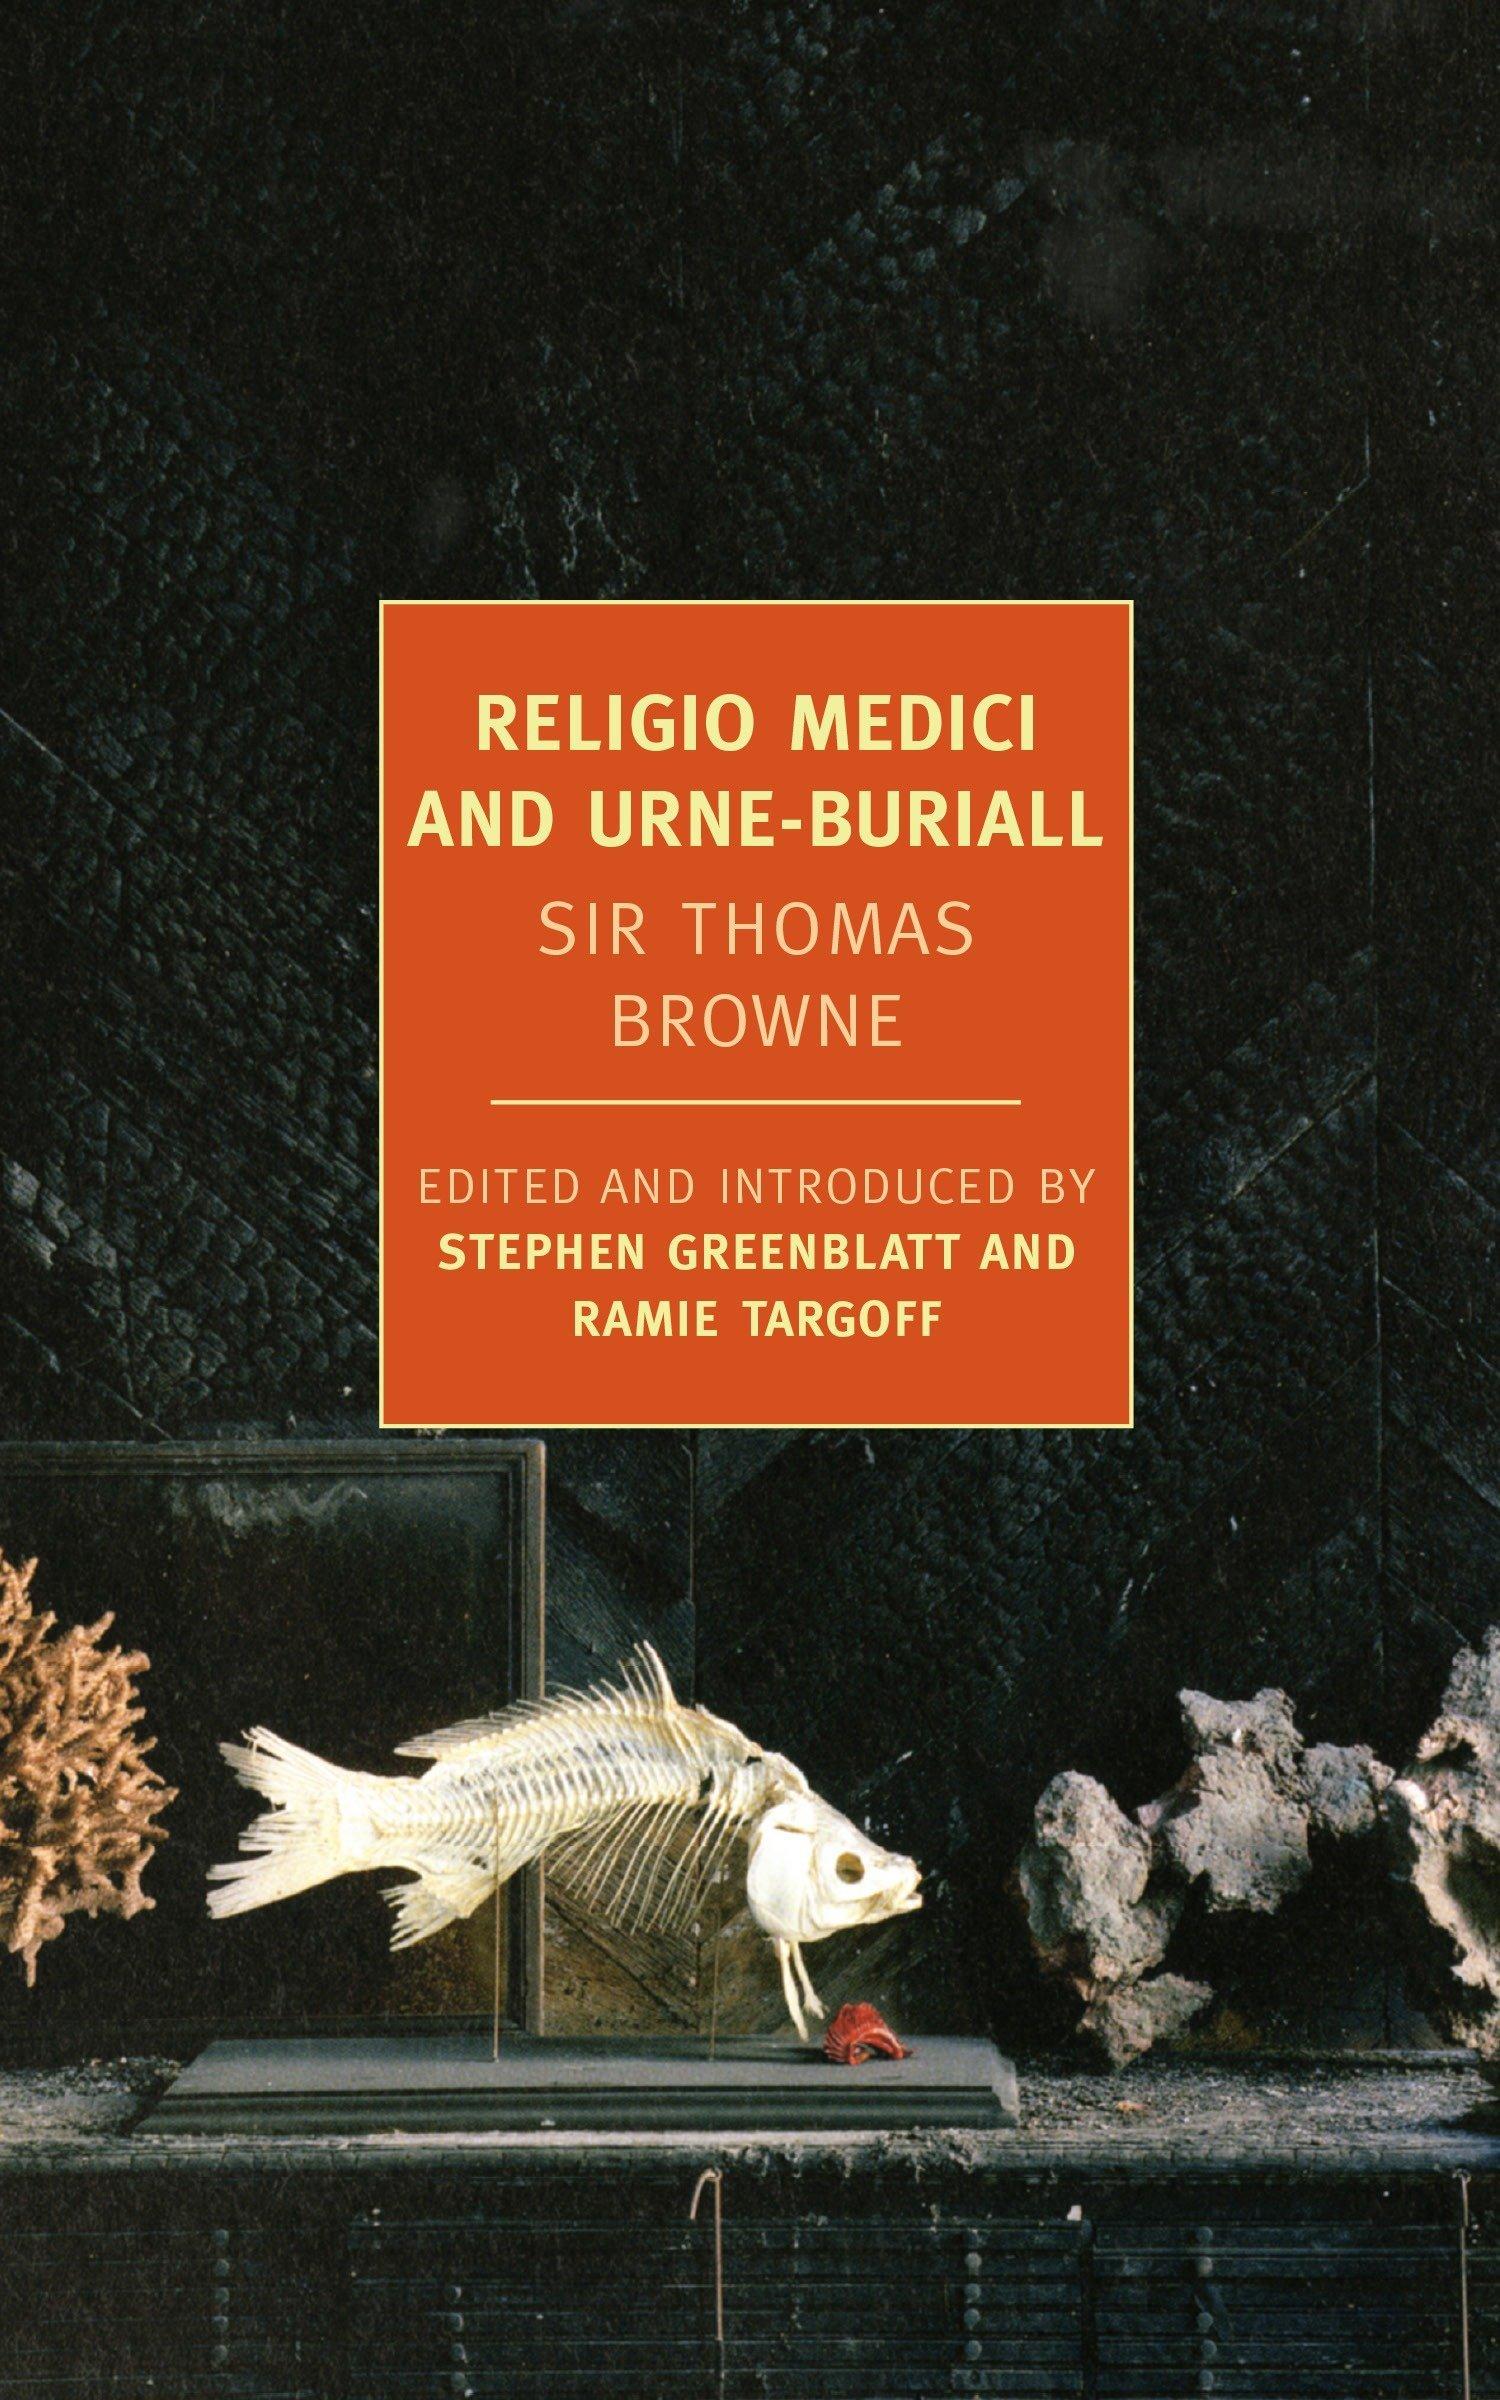 Religio Medici and Urne-Buriall (New York Review Books Classics): Sir Thomas  Browne, Stephen Greenblatt, Ramie Targoff: 9781590174883: Amazon.com: Books